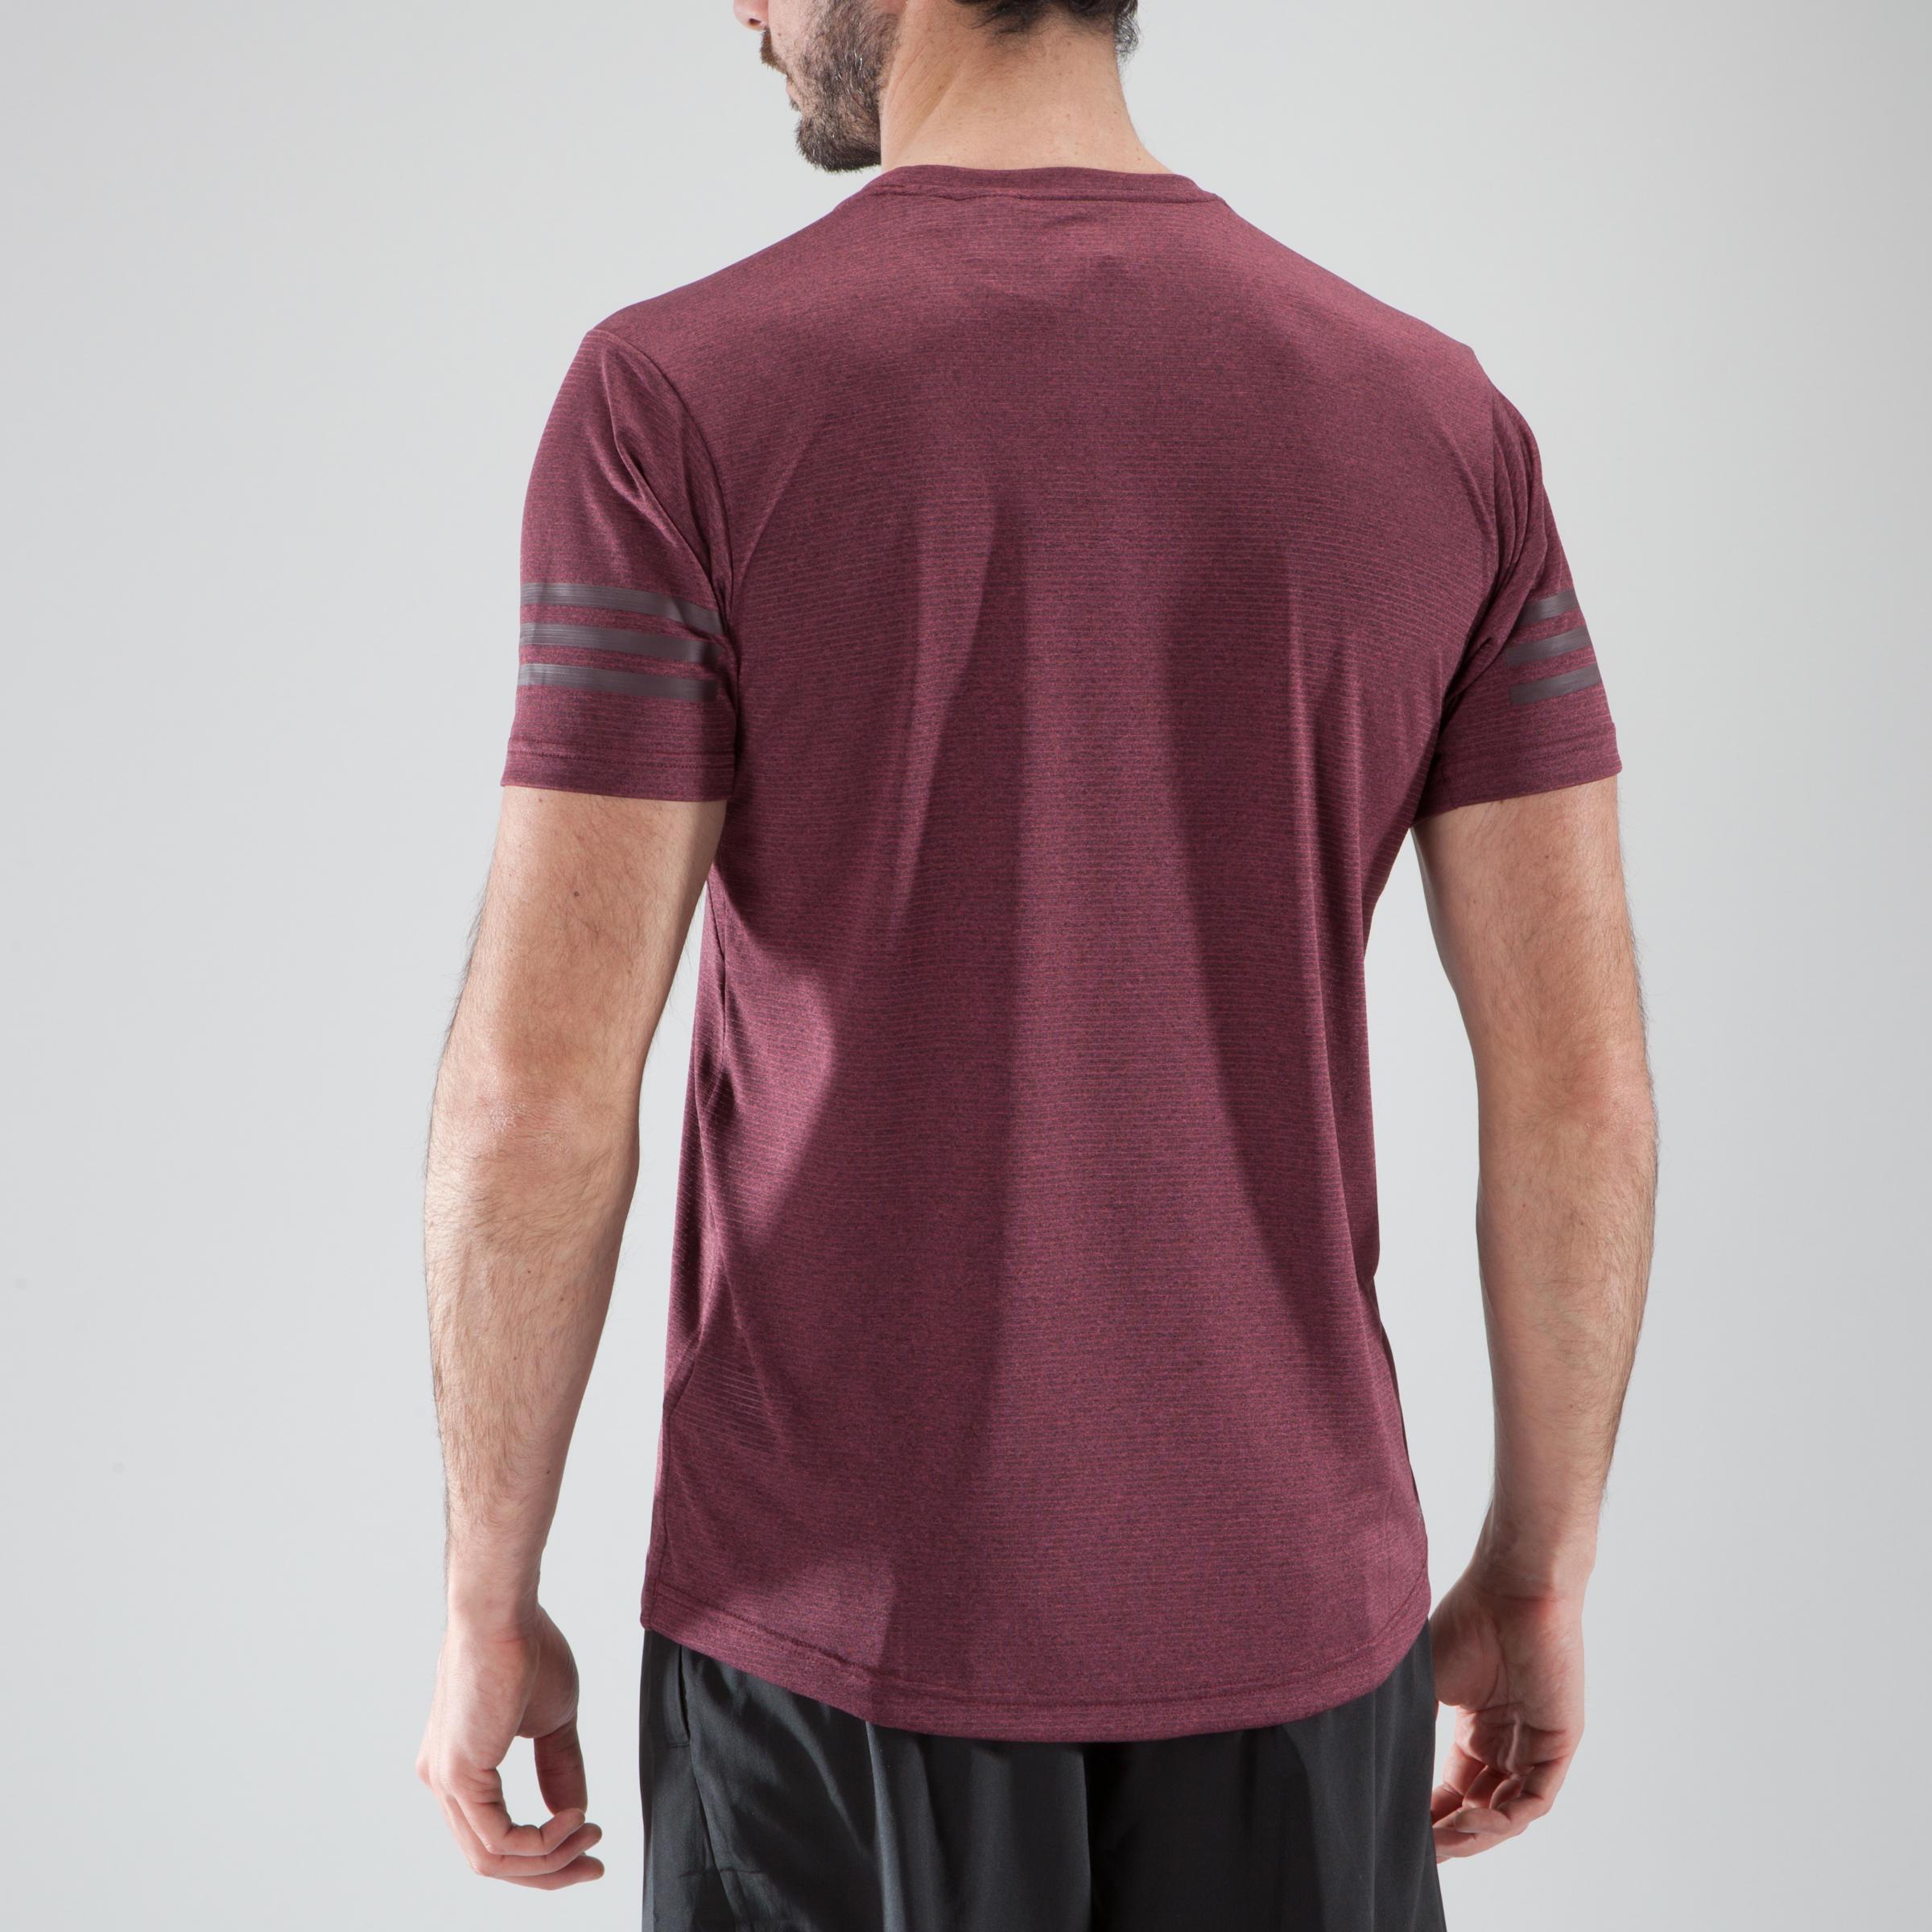 Homme Cardio Fitness Adidas Training Shirt T Bordeaux Mqsuzvp nOPN0kwX8